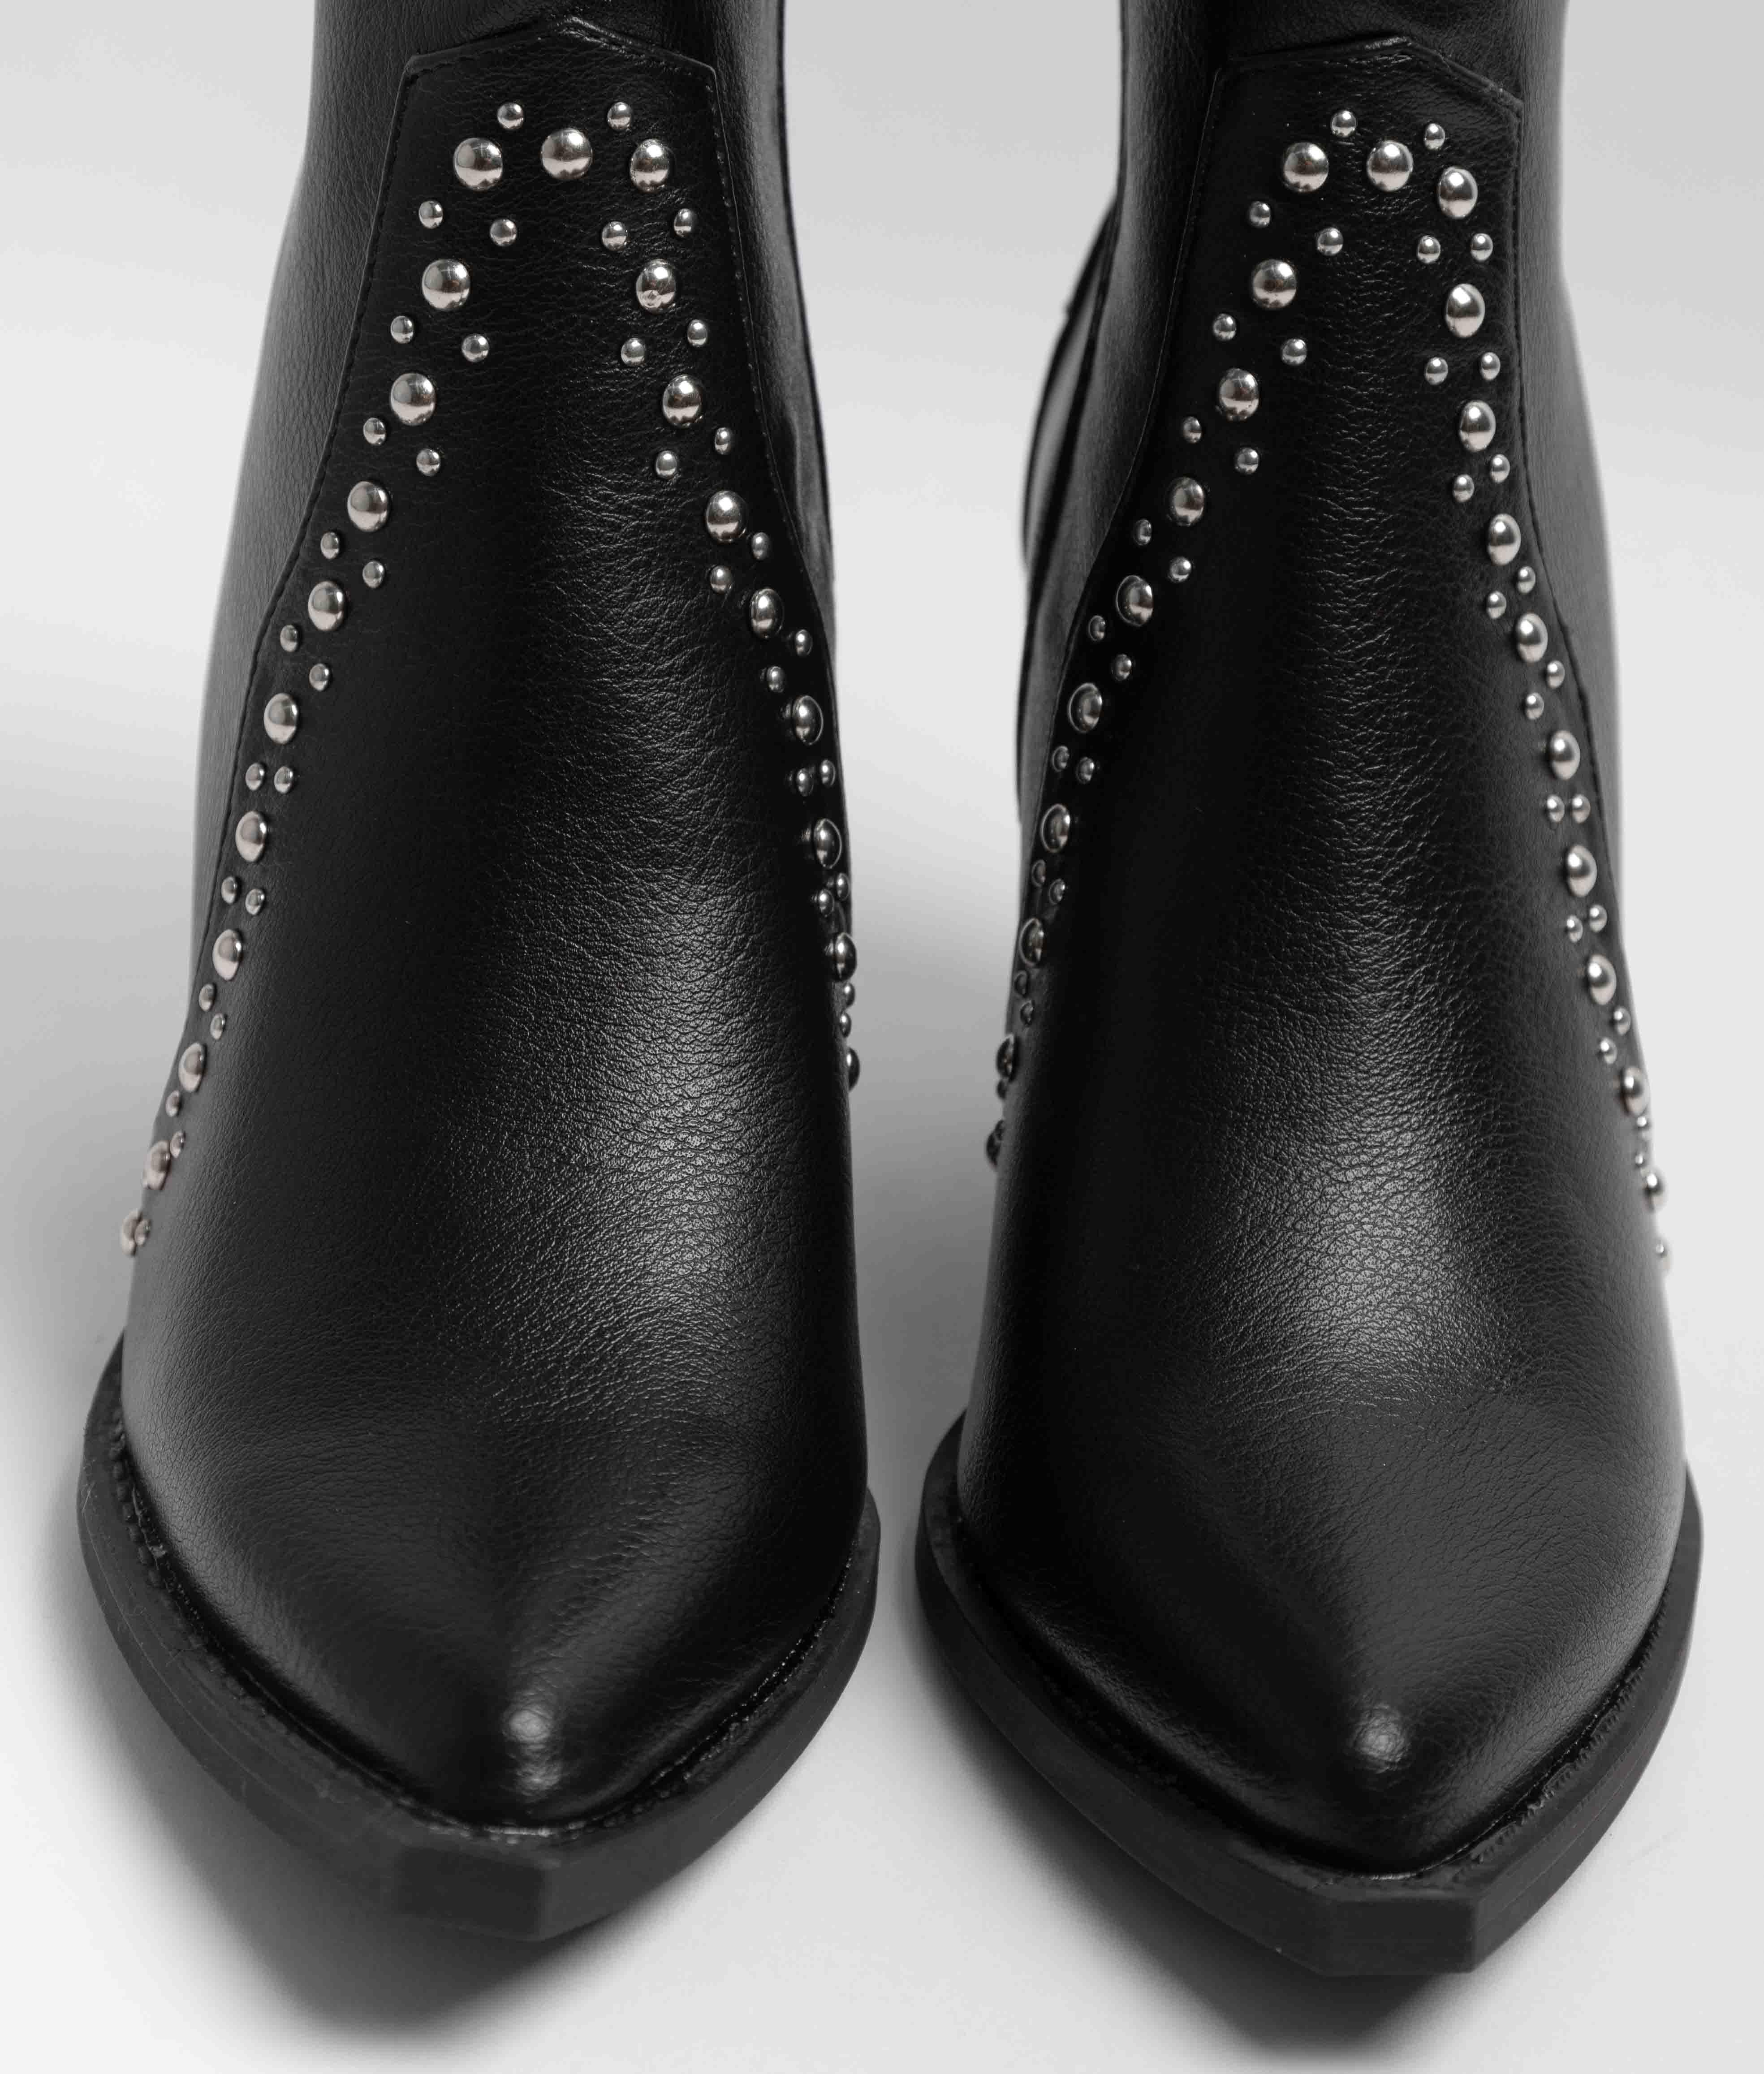 Boot Petite Colma - Noir